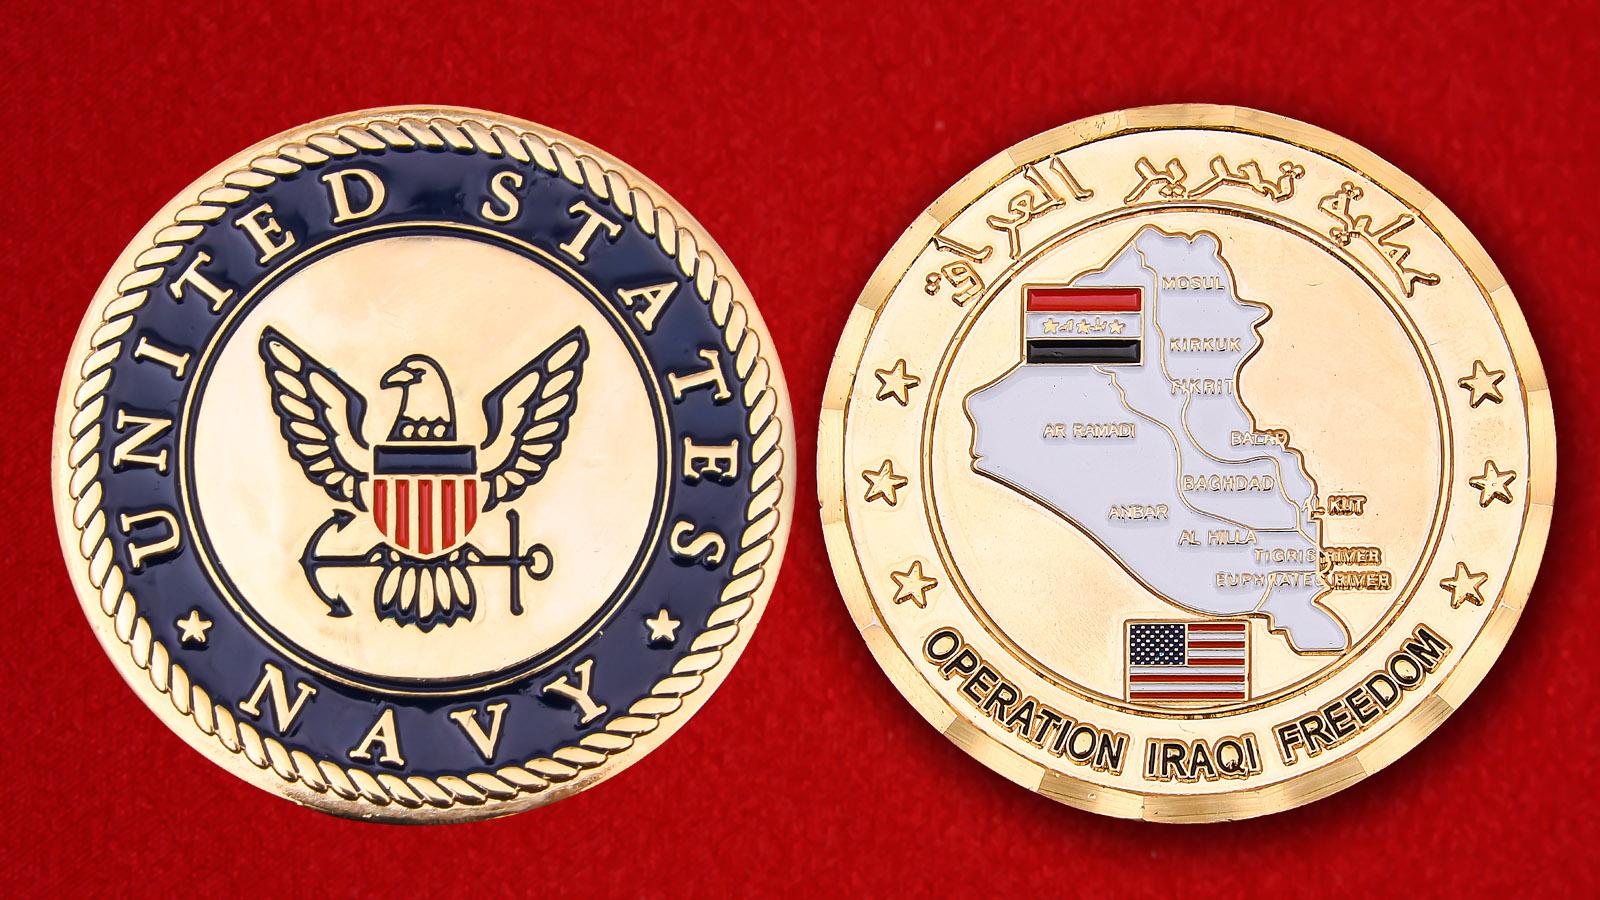 US Navy Operation Iraqi Freedom Challenge Coin